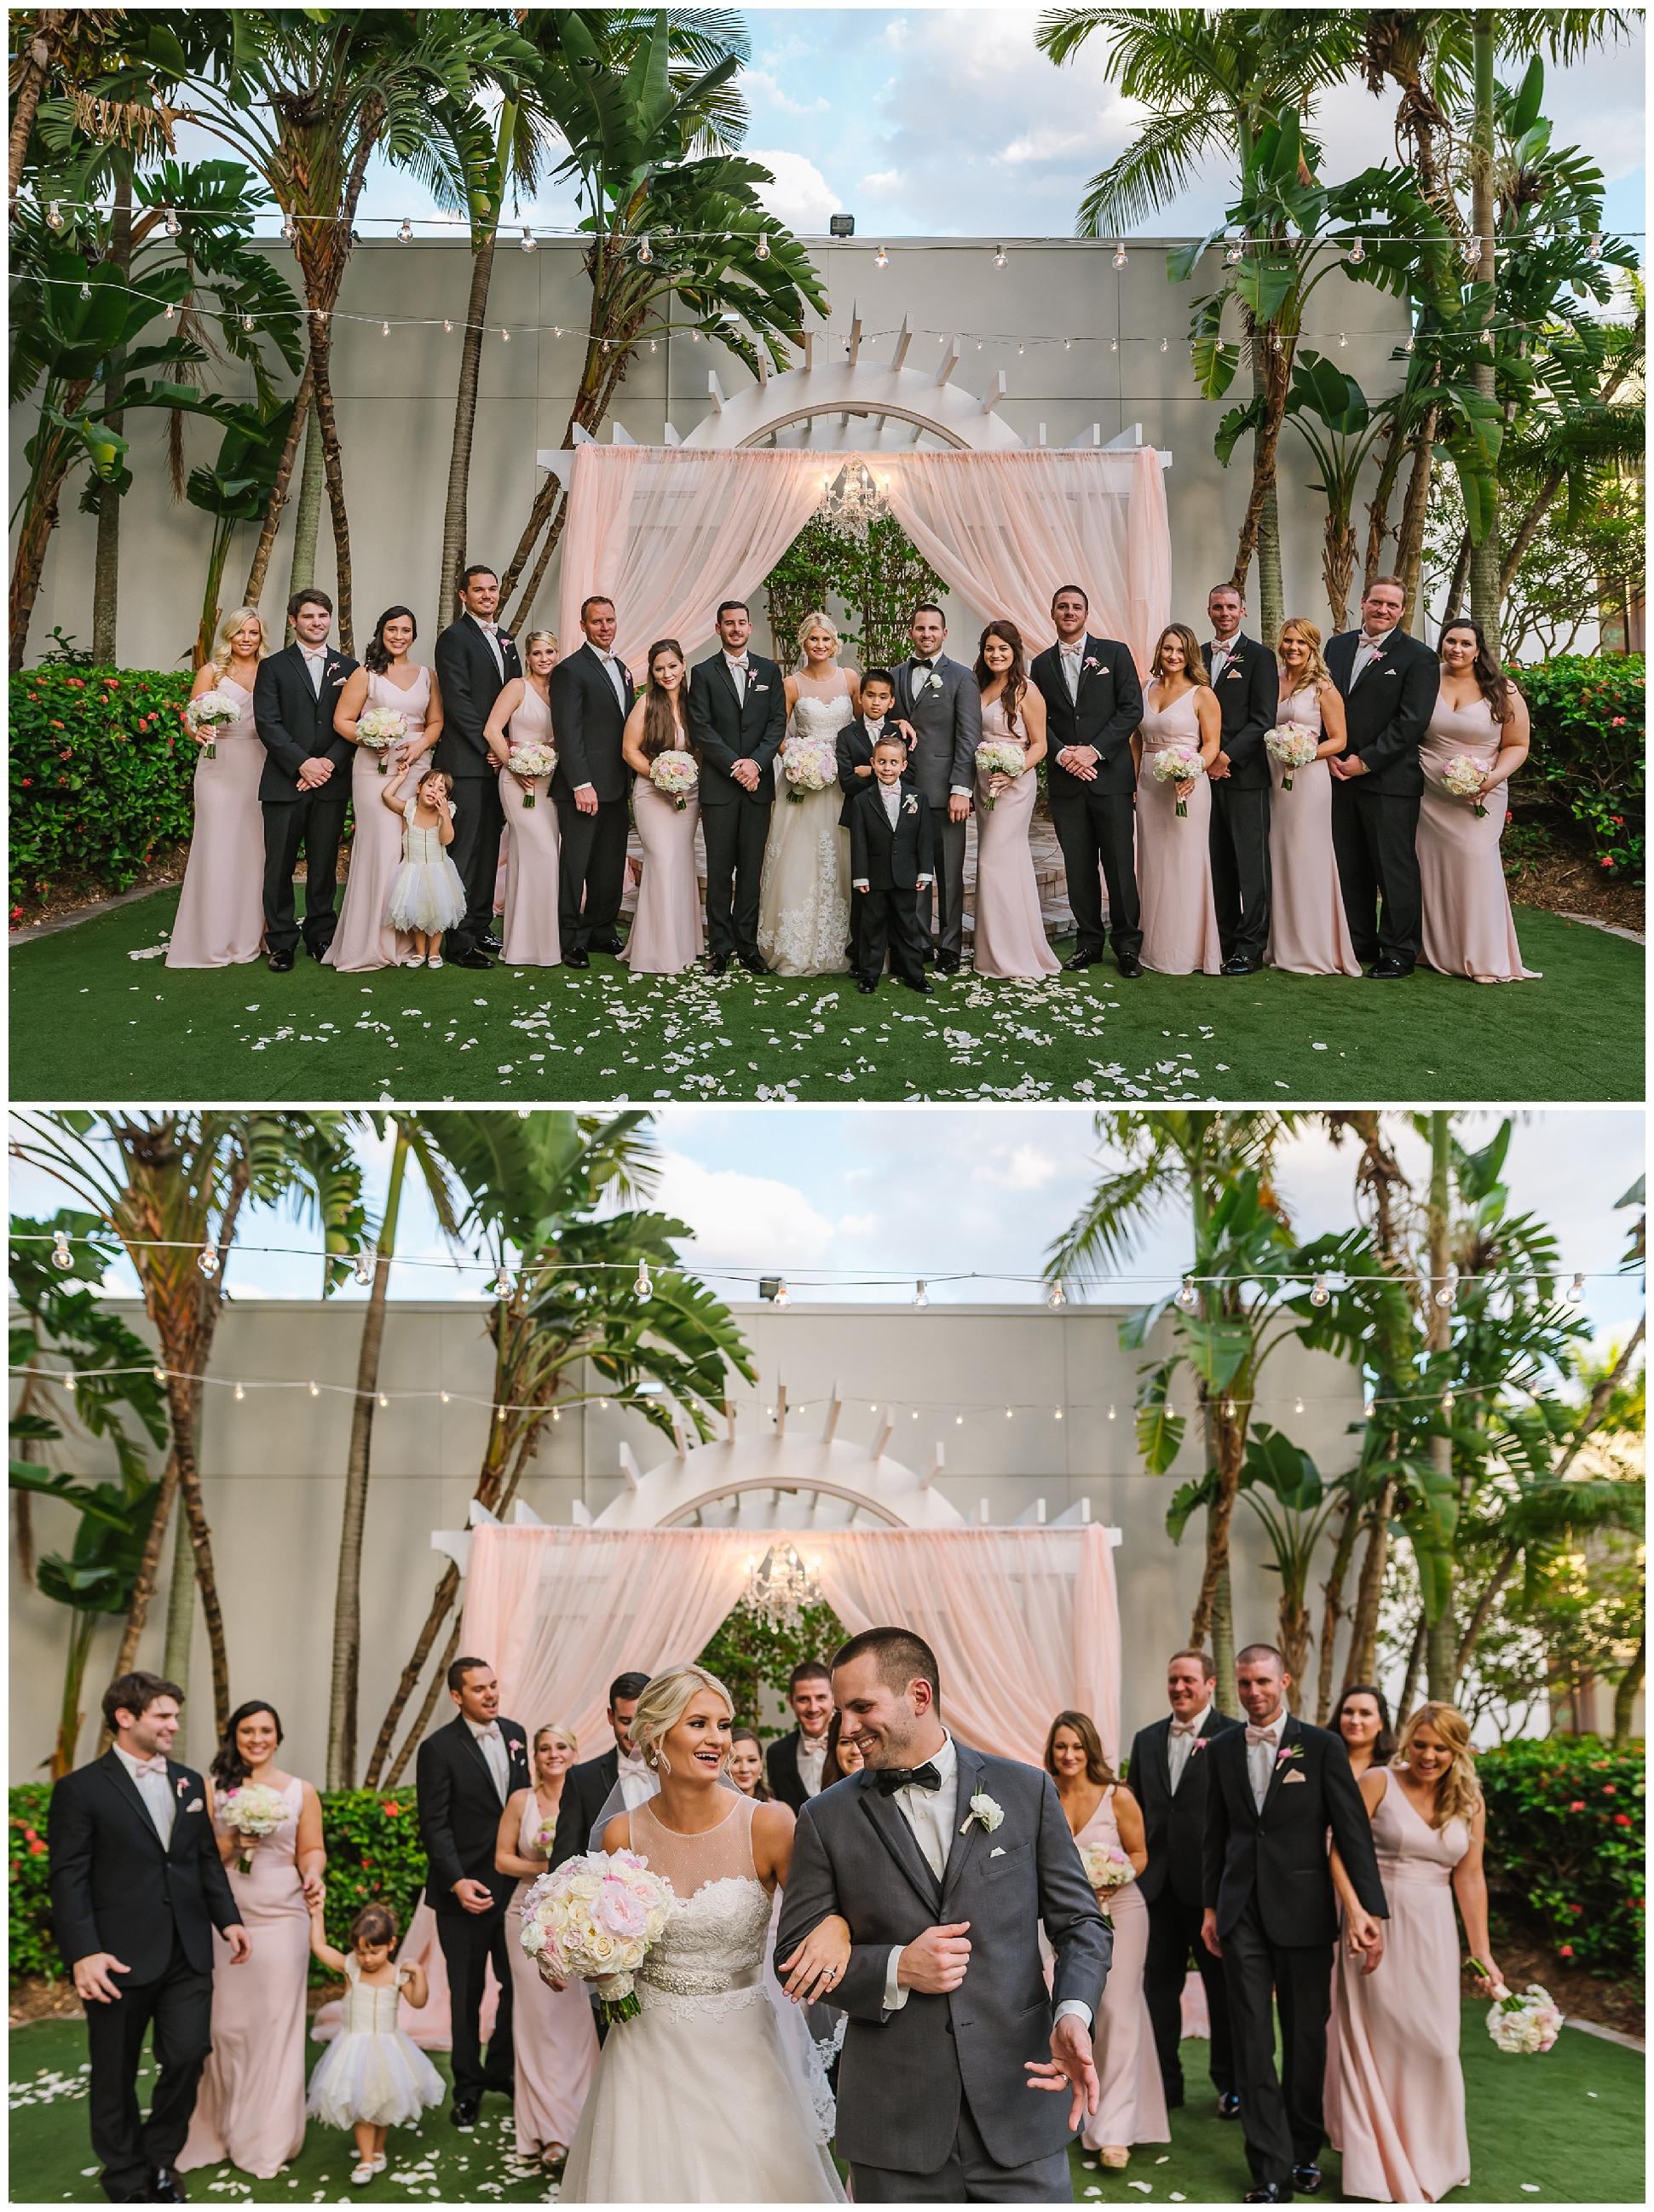 Sarasota-wedding-photographer-hyatt-regency-blush_0045.jpg